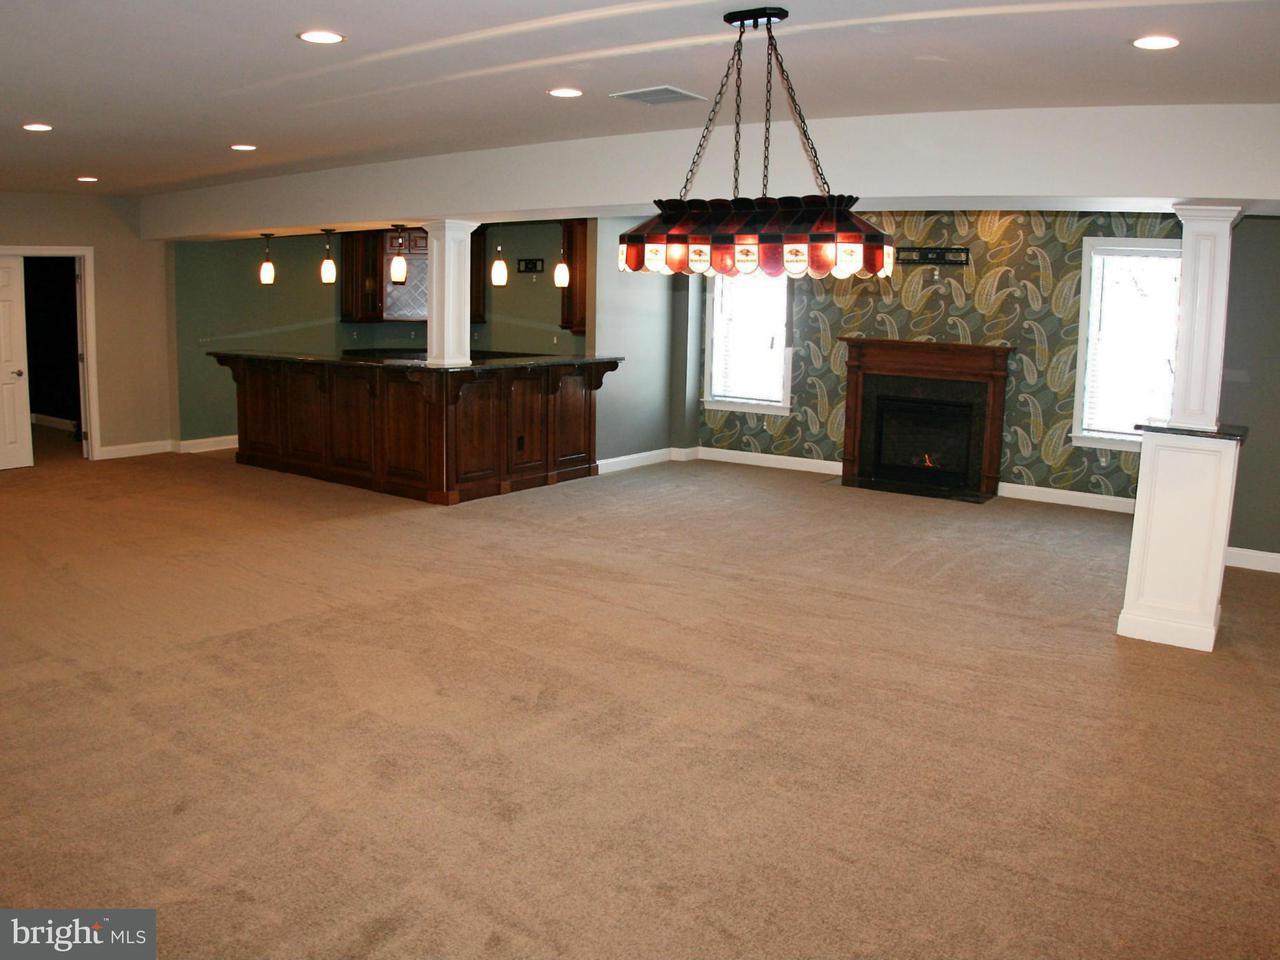 Additional photo for property listing at 2920 ROLLING GREEN Drive 2920 ROLLING GREEN Drive Churchville, Maryland 21028 Estados Unidos